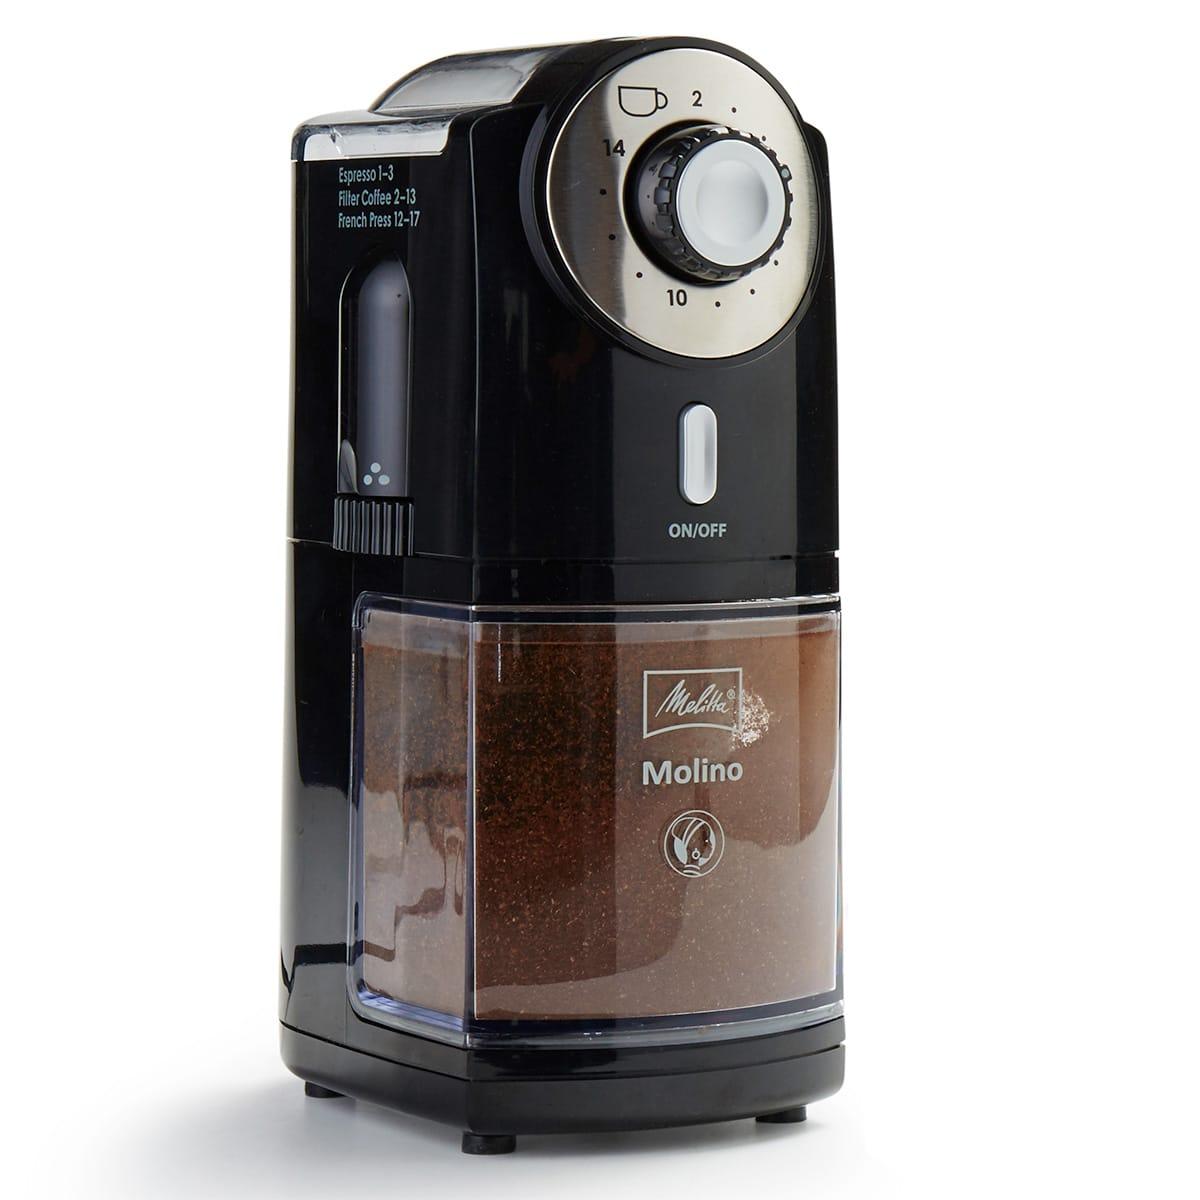 Med Cirkelpigen logo - Velduftende, friskmalet kaffe til hver en kop